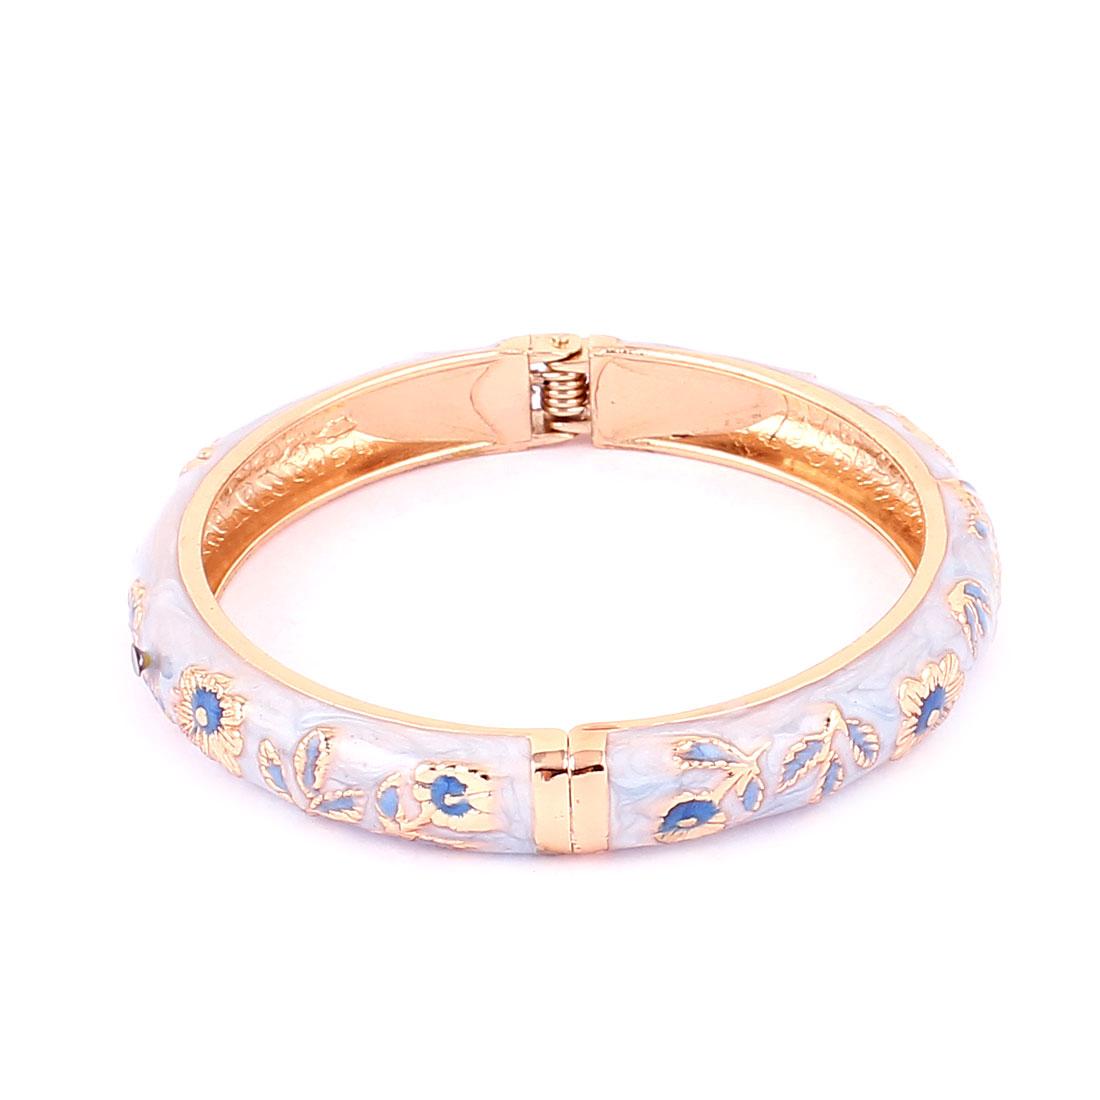 Lady Women Gold Plated Hinged Enamel Floral Bangle Bracelet Jewelry